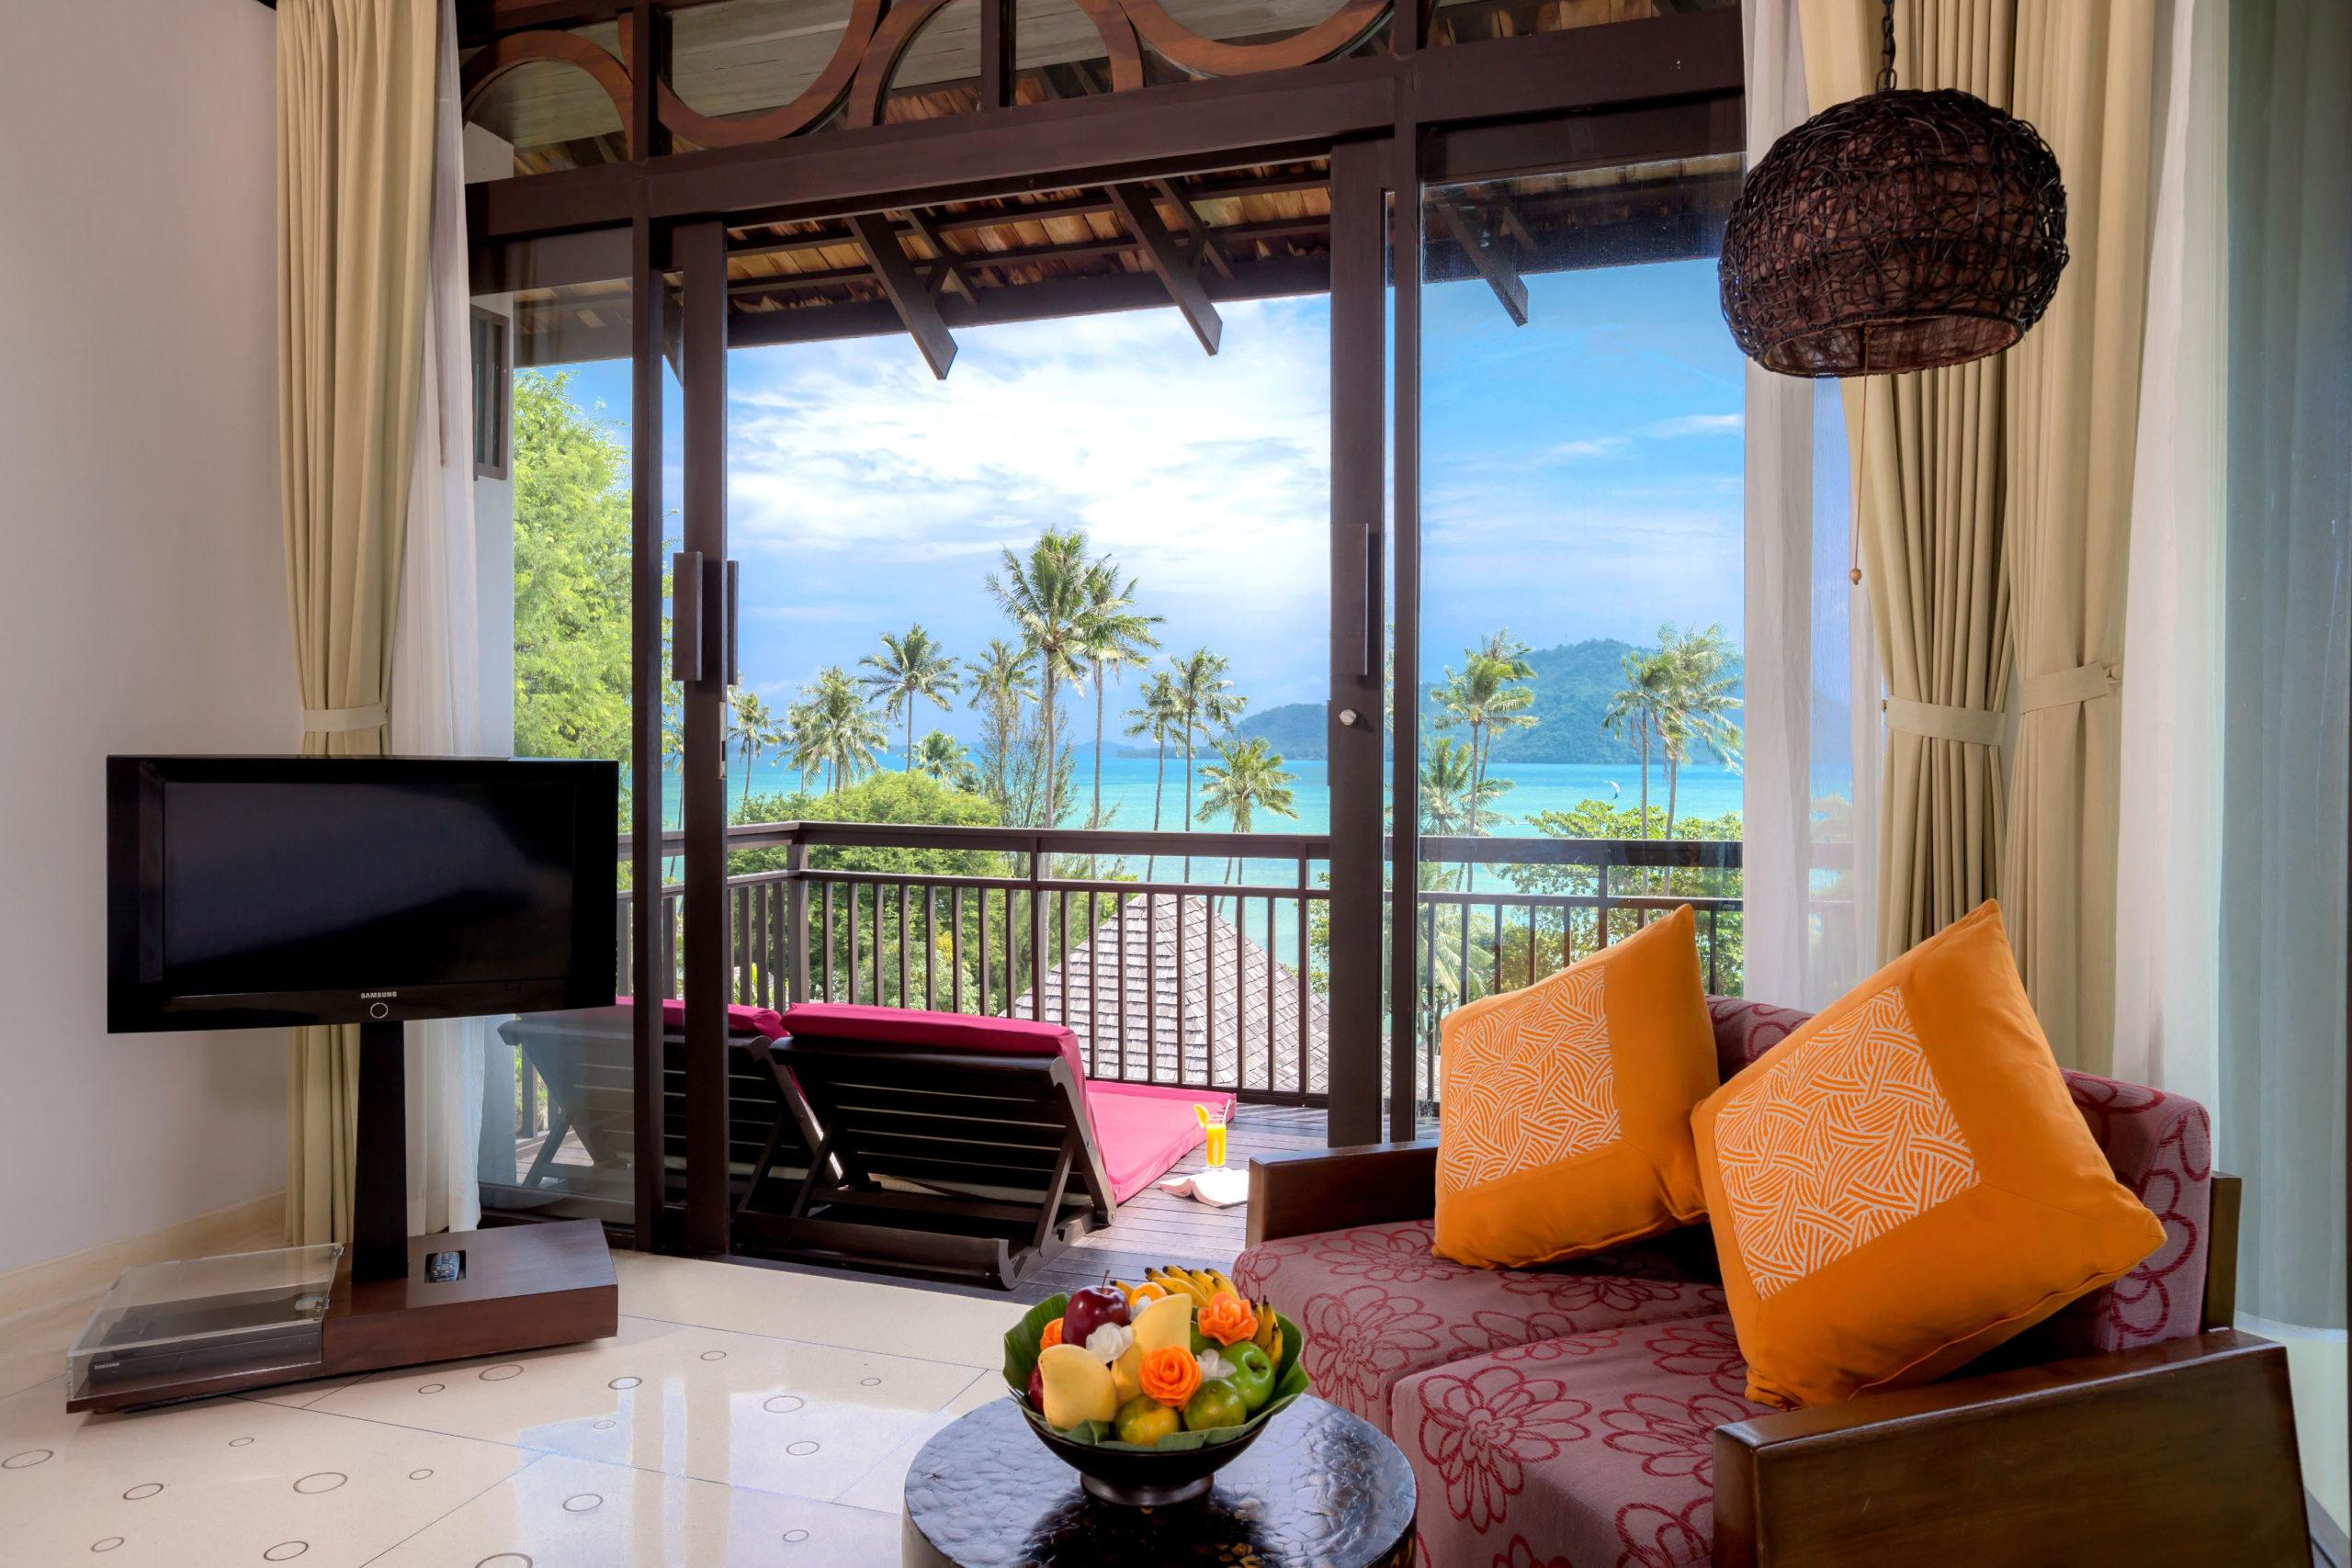 003_Deluxe Seaview Villa_Bedroom The Vijitt Resort Phuket